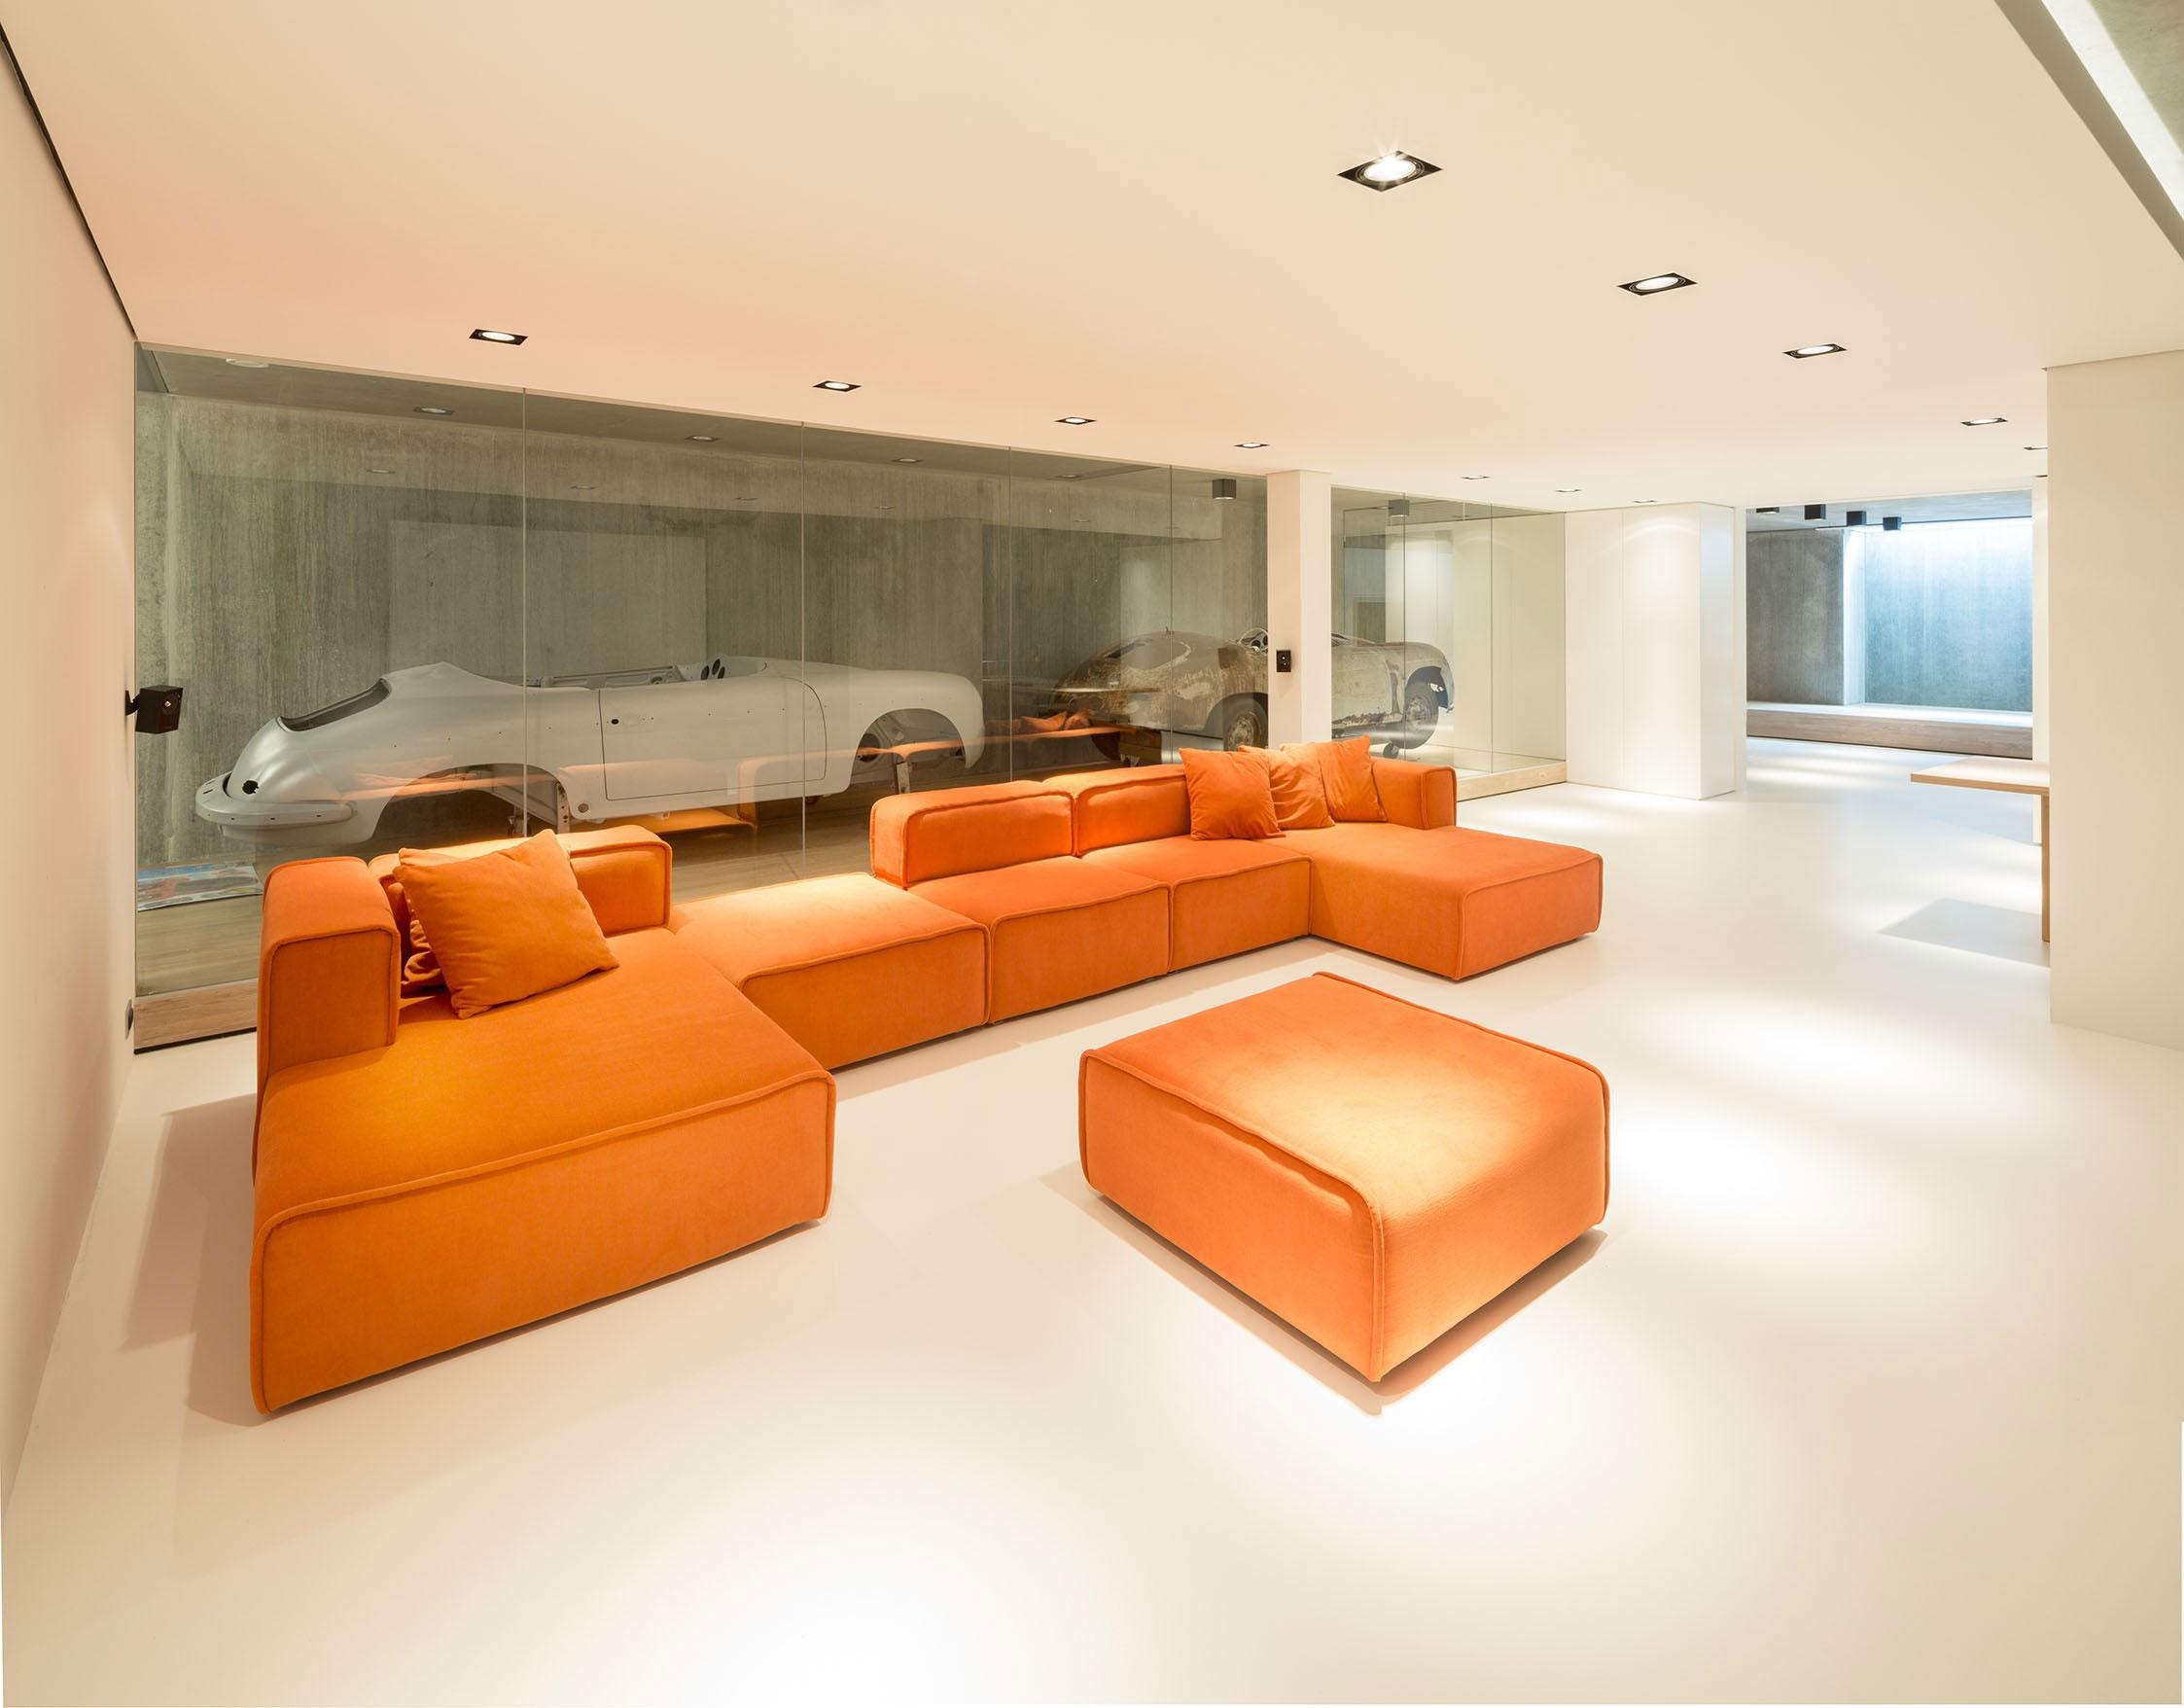 Modern Huizen Country House Located in a Quiet Rural Setting by De Brouwer Binnenwerk-05